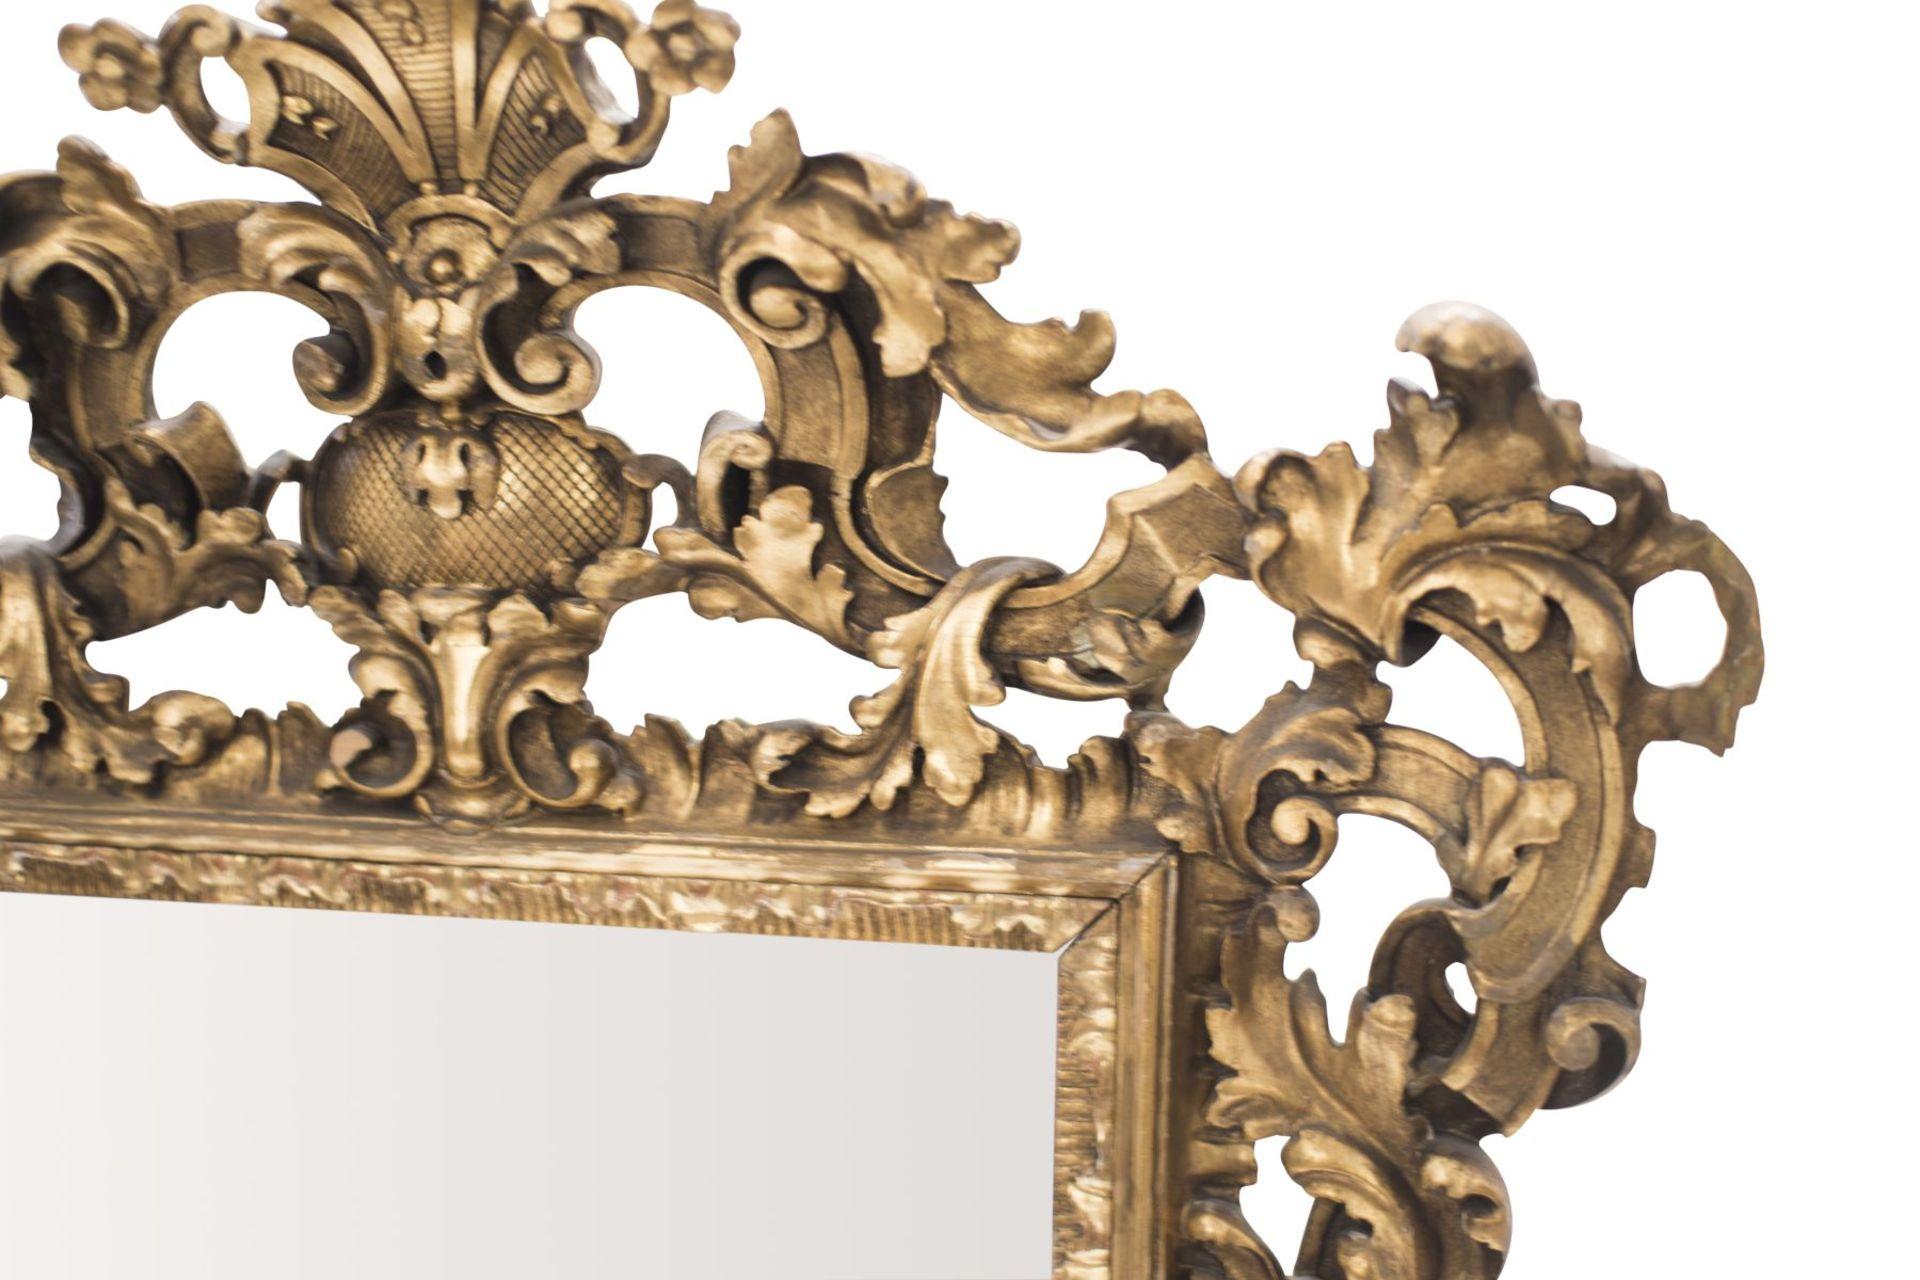 Baroque style salon mirror, 19th century - Image 4 of 6